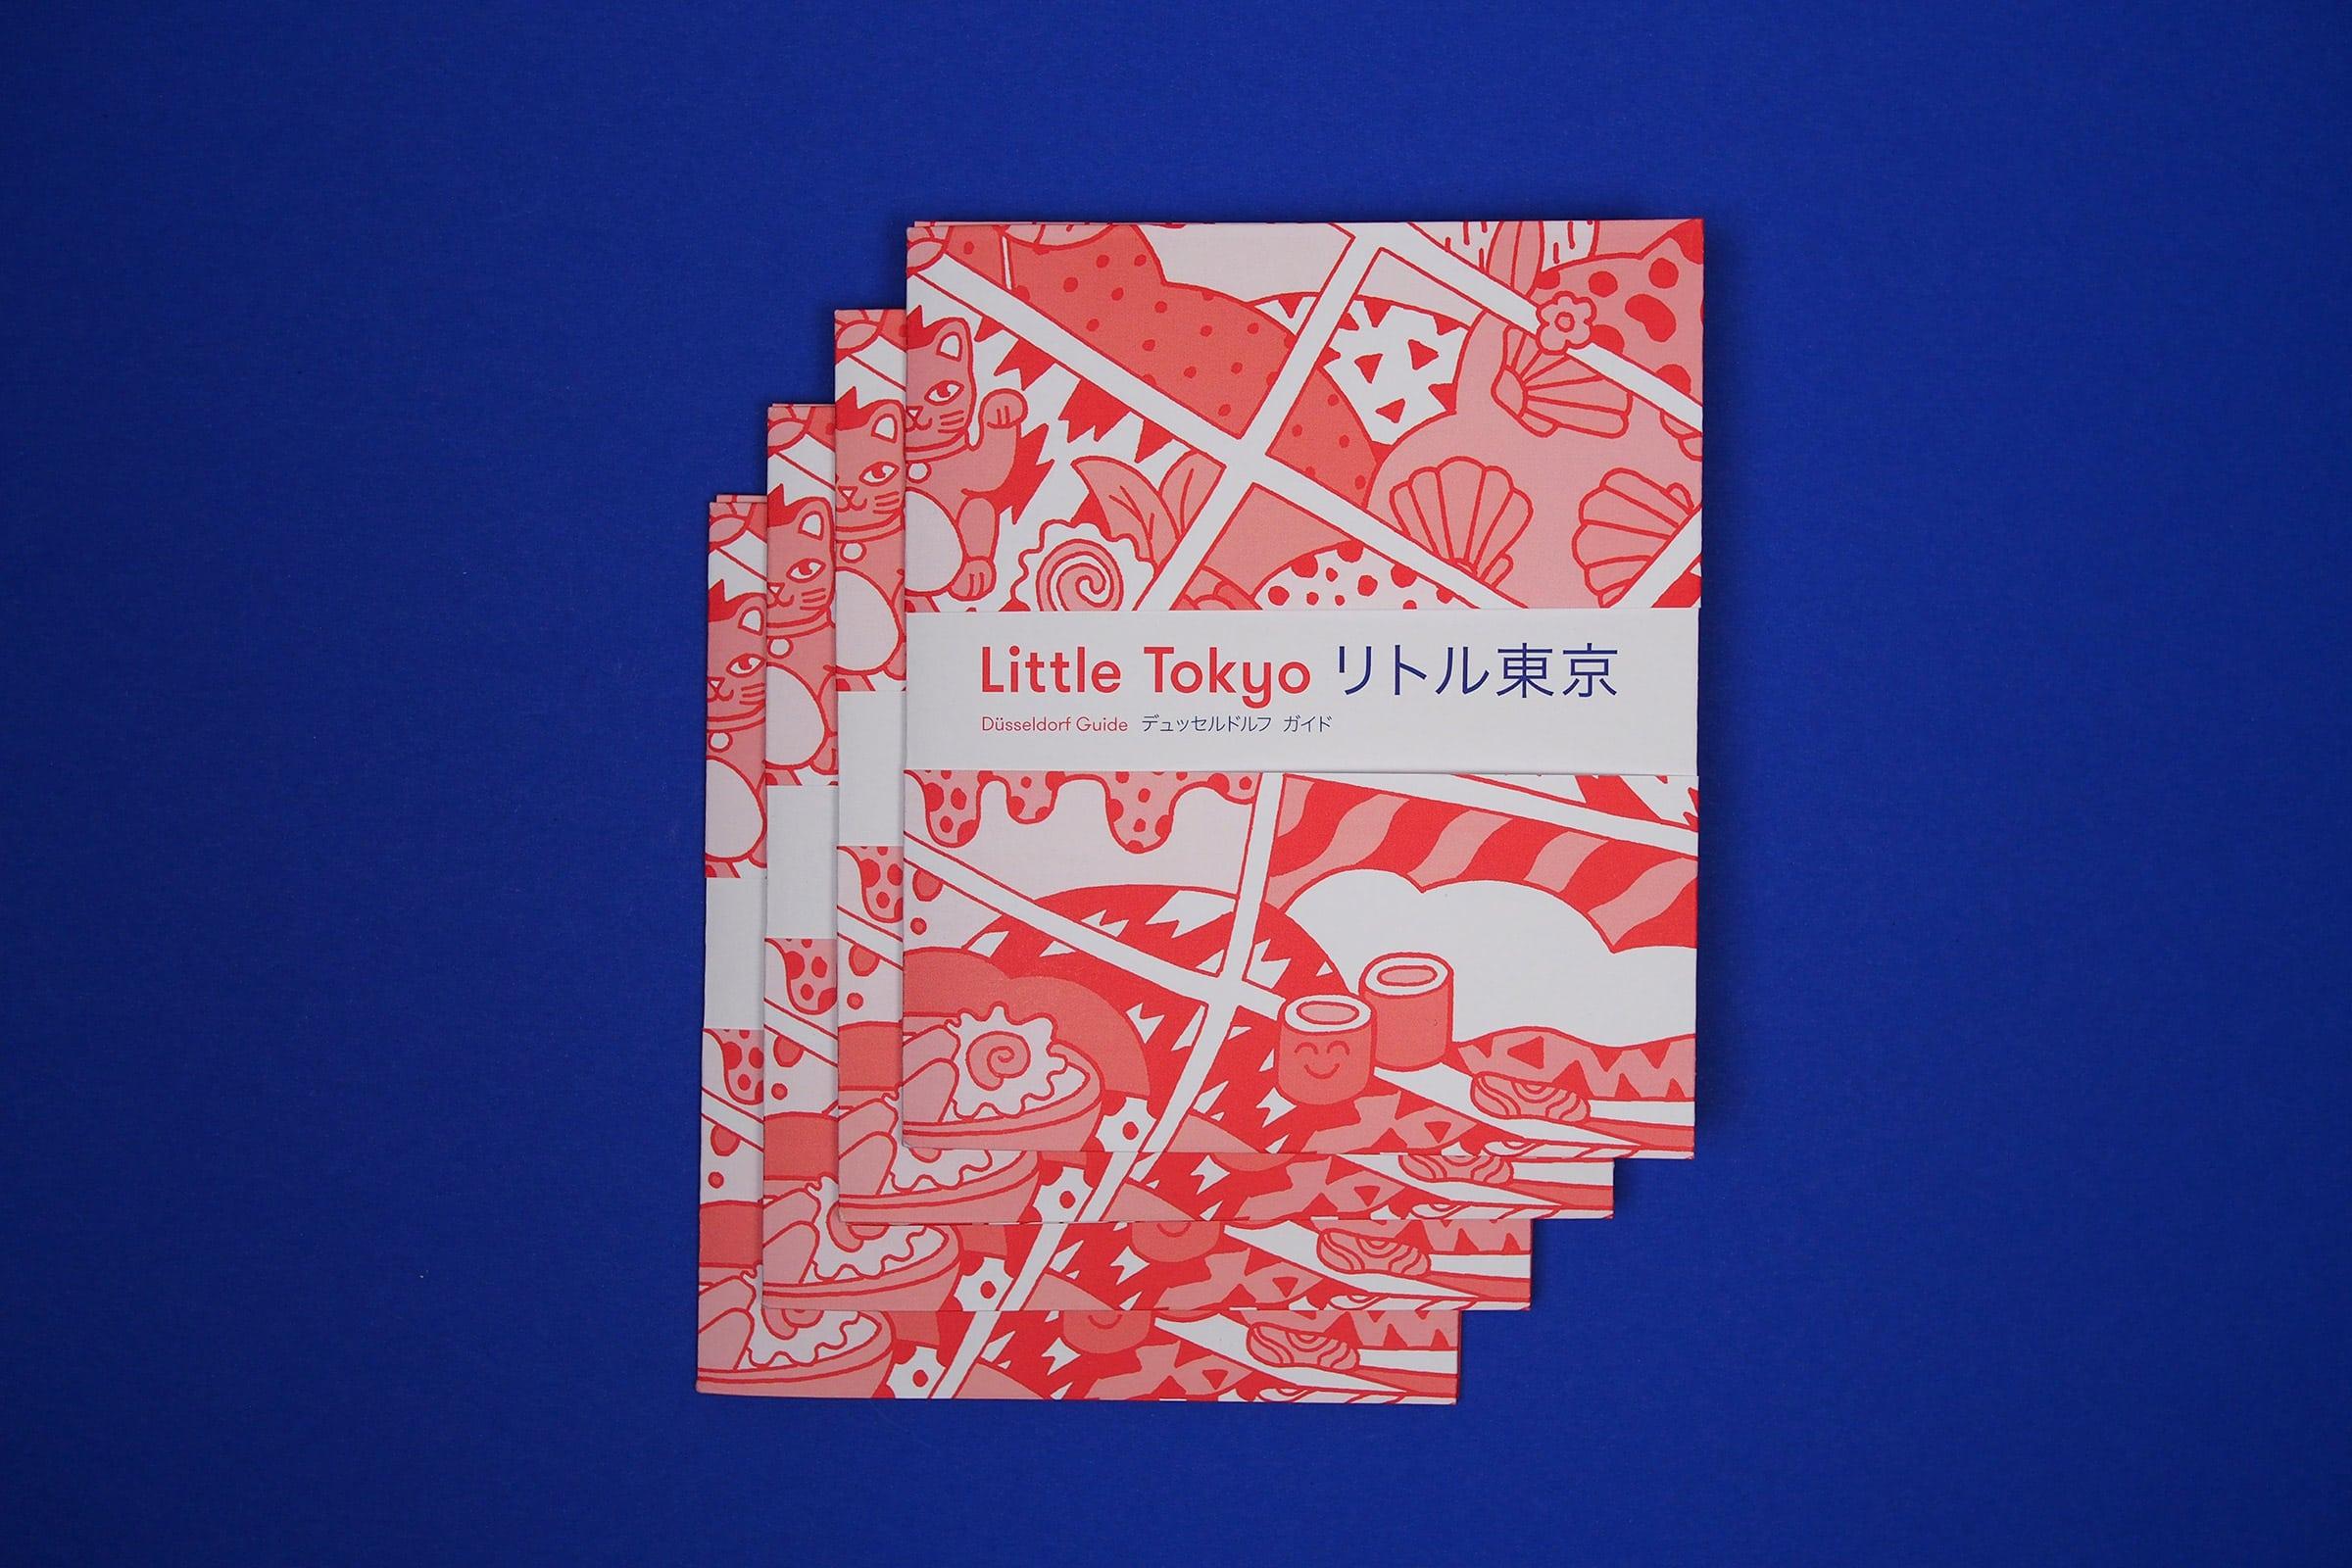 KittoKatsu, Little Tokyo Map, JapanTown, Düsseldorf, Düsseldorf Guide, Japanische Restaurants